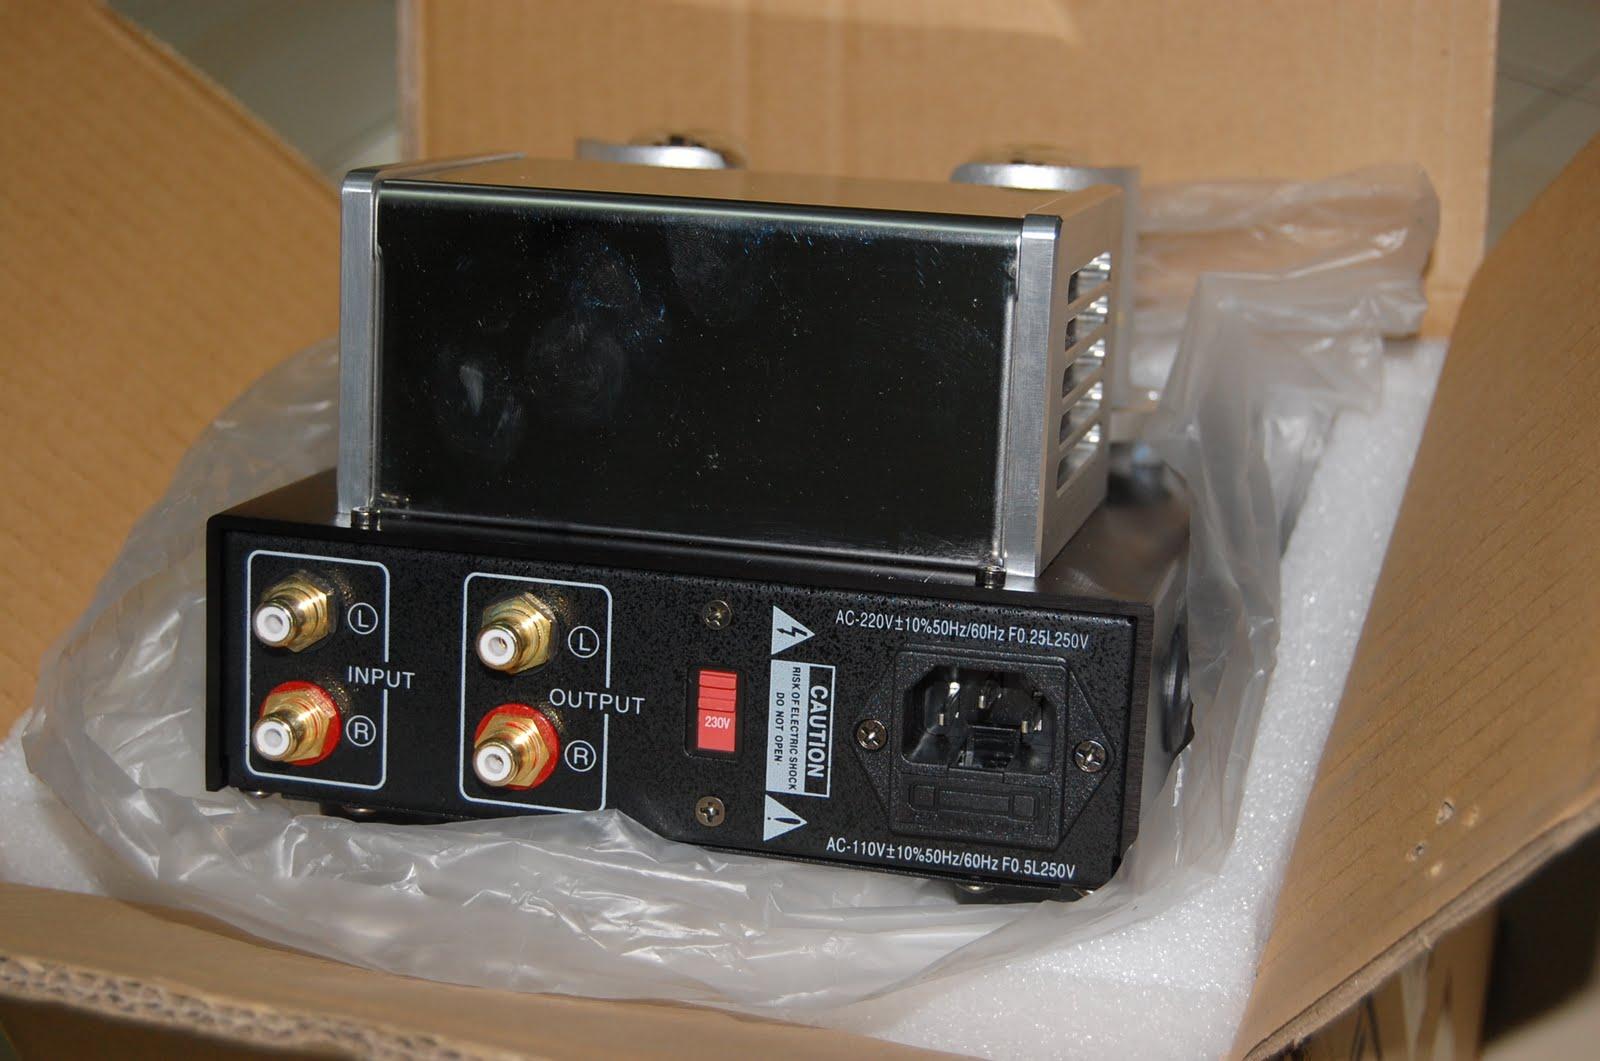 HiFi4Sale (Malaysia) / 马来西亚自由买卖音响器材的好天地: April 2010